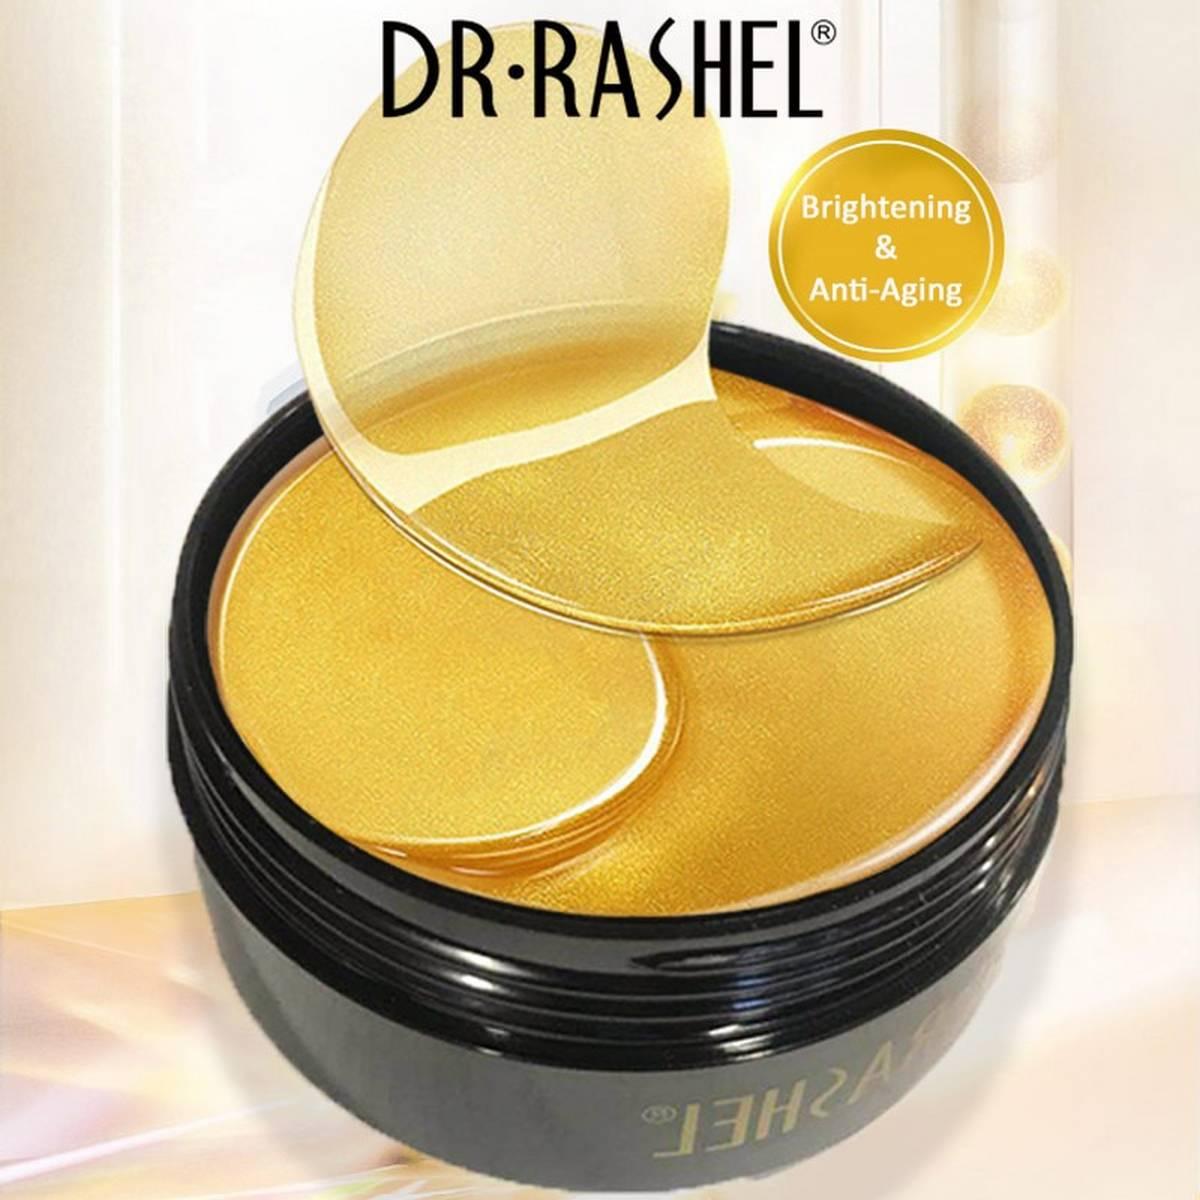 Dr.Rashel 24k Gold Collagen Hydrogel Eye Mask 60pcs (original)